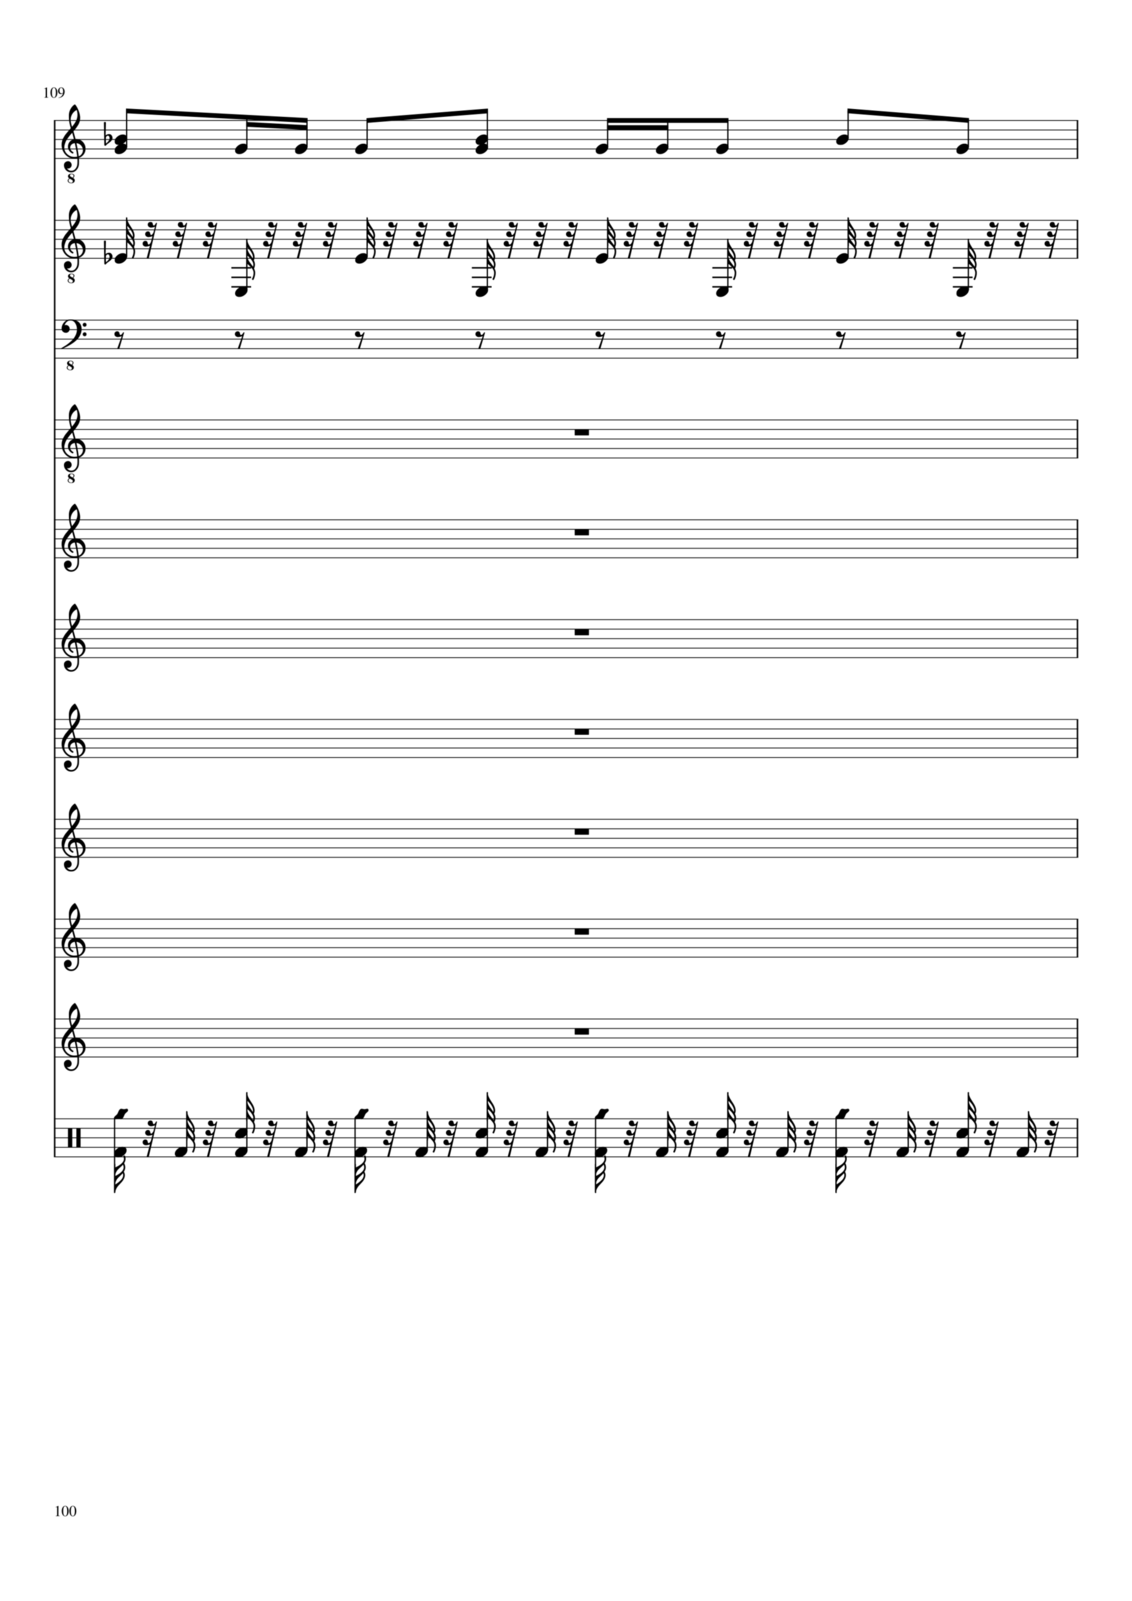 Belyiy sokol slide, Image 100